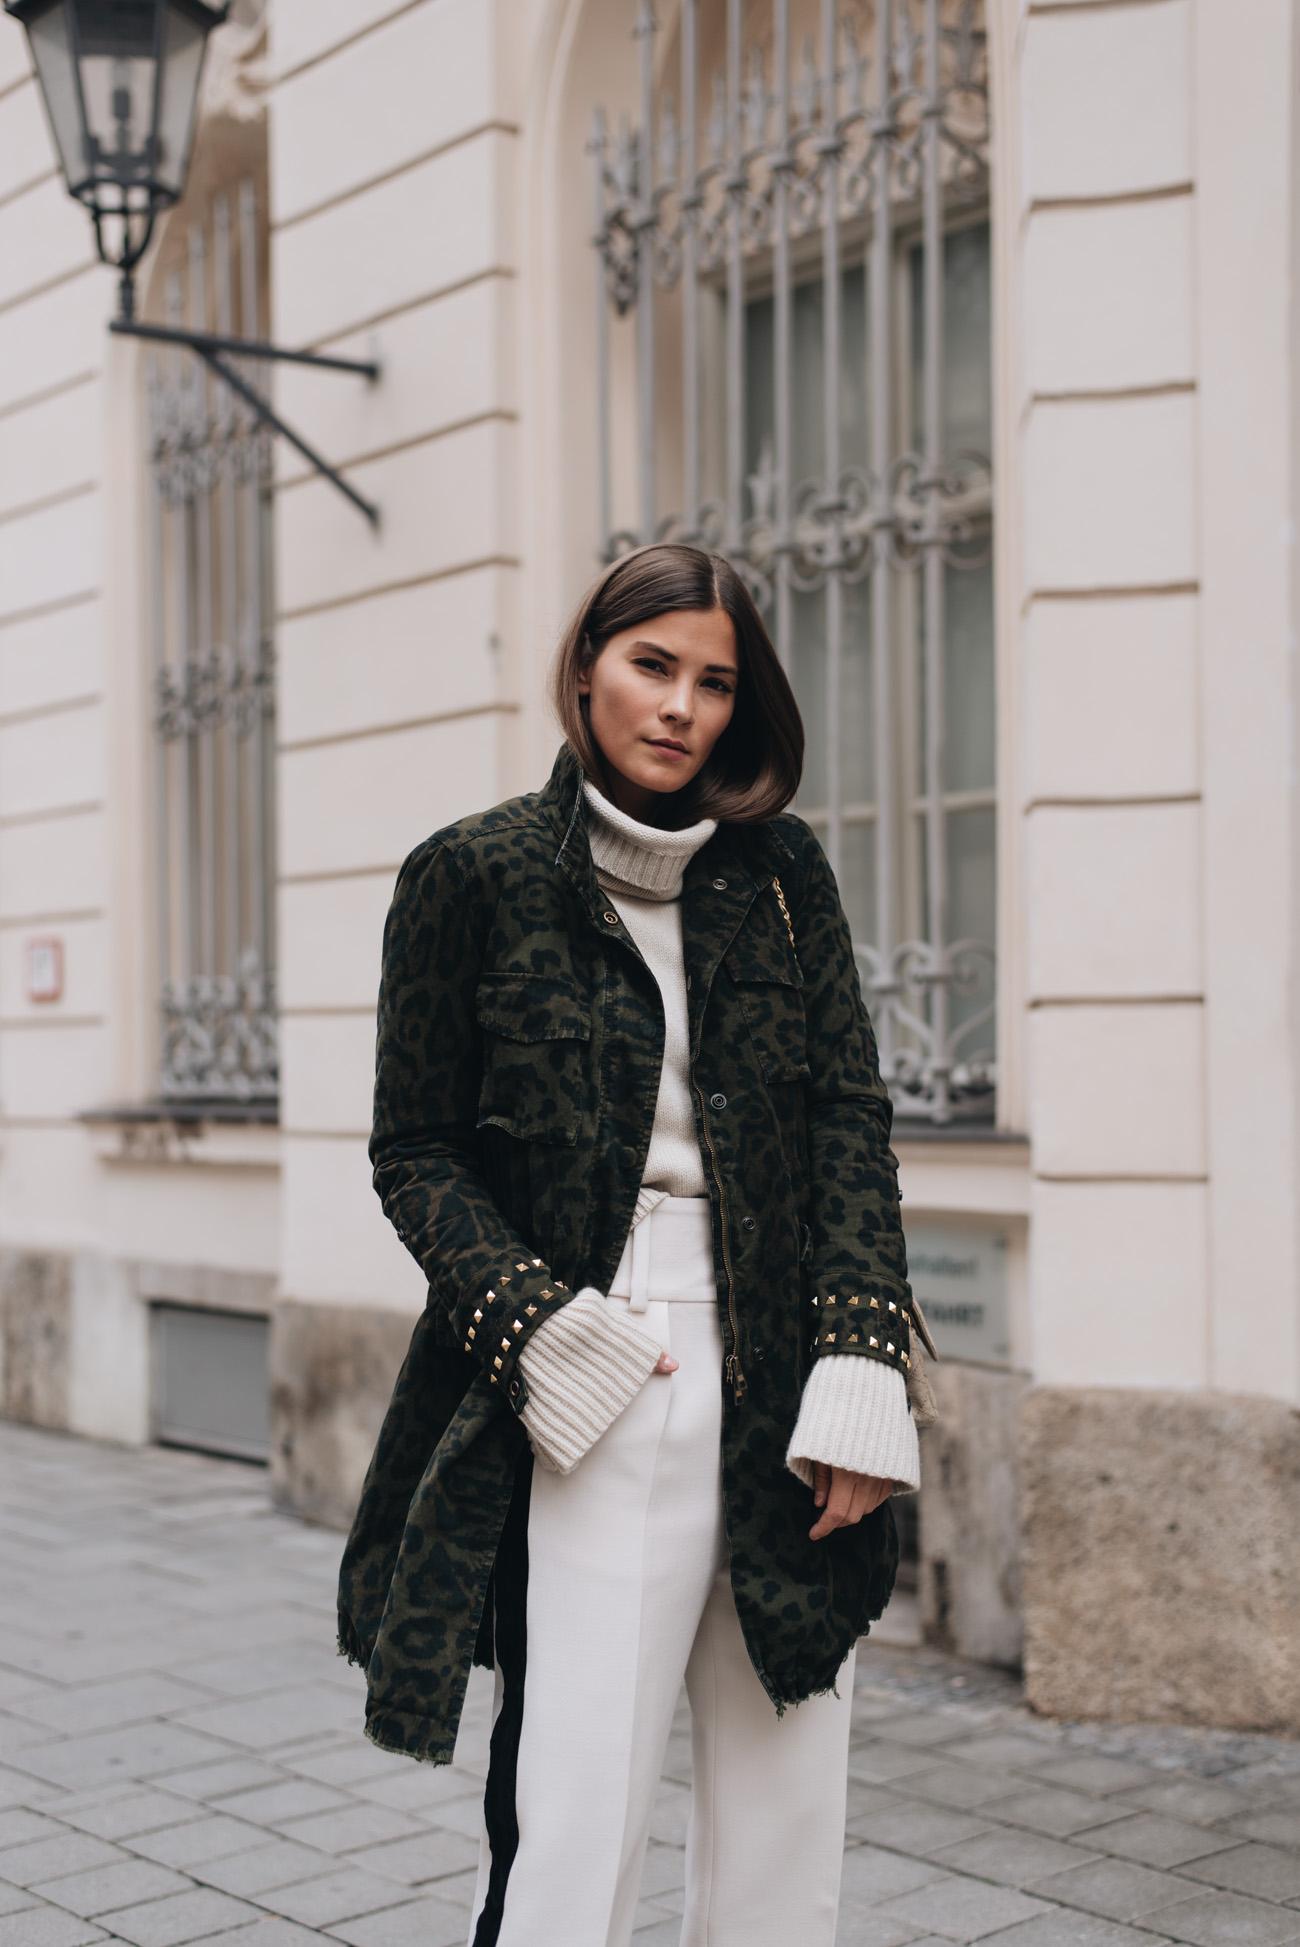 Modetrends-herbst-und-winter-2017-parka-mäntel-leomuster-chanel-timeless-canvas-vintage-bag-nina-schwichtenberg-fashiioncarpet